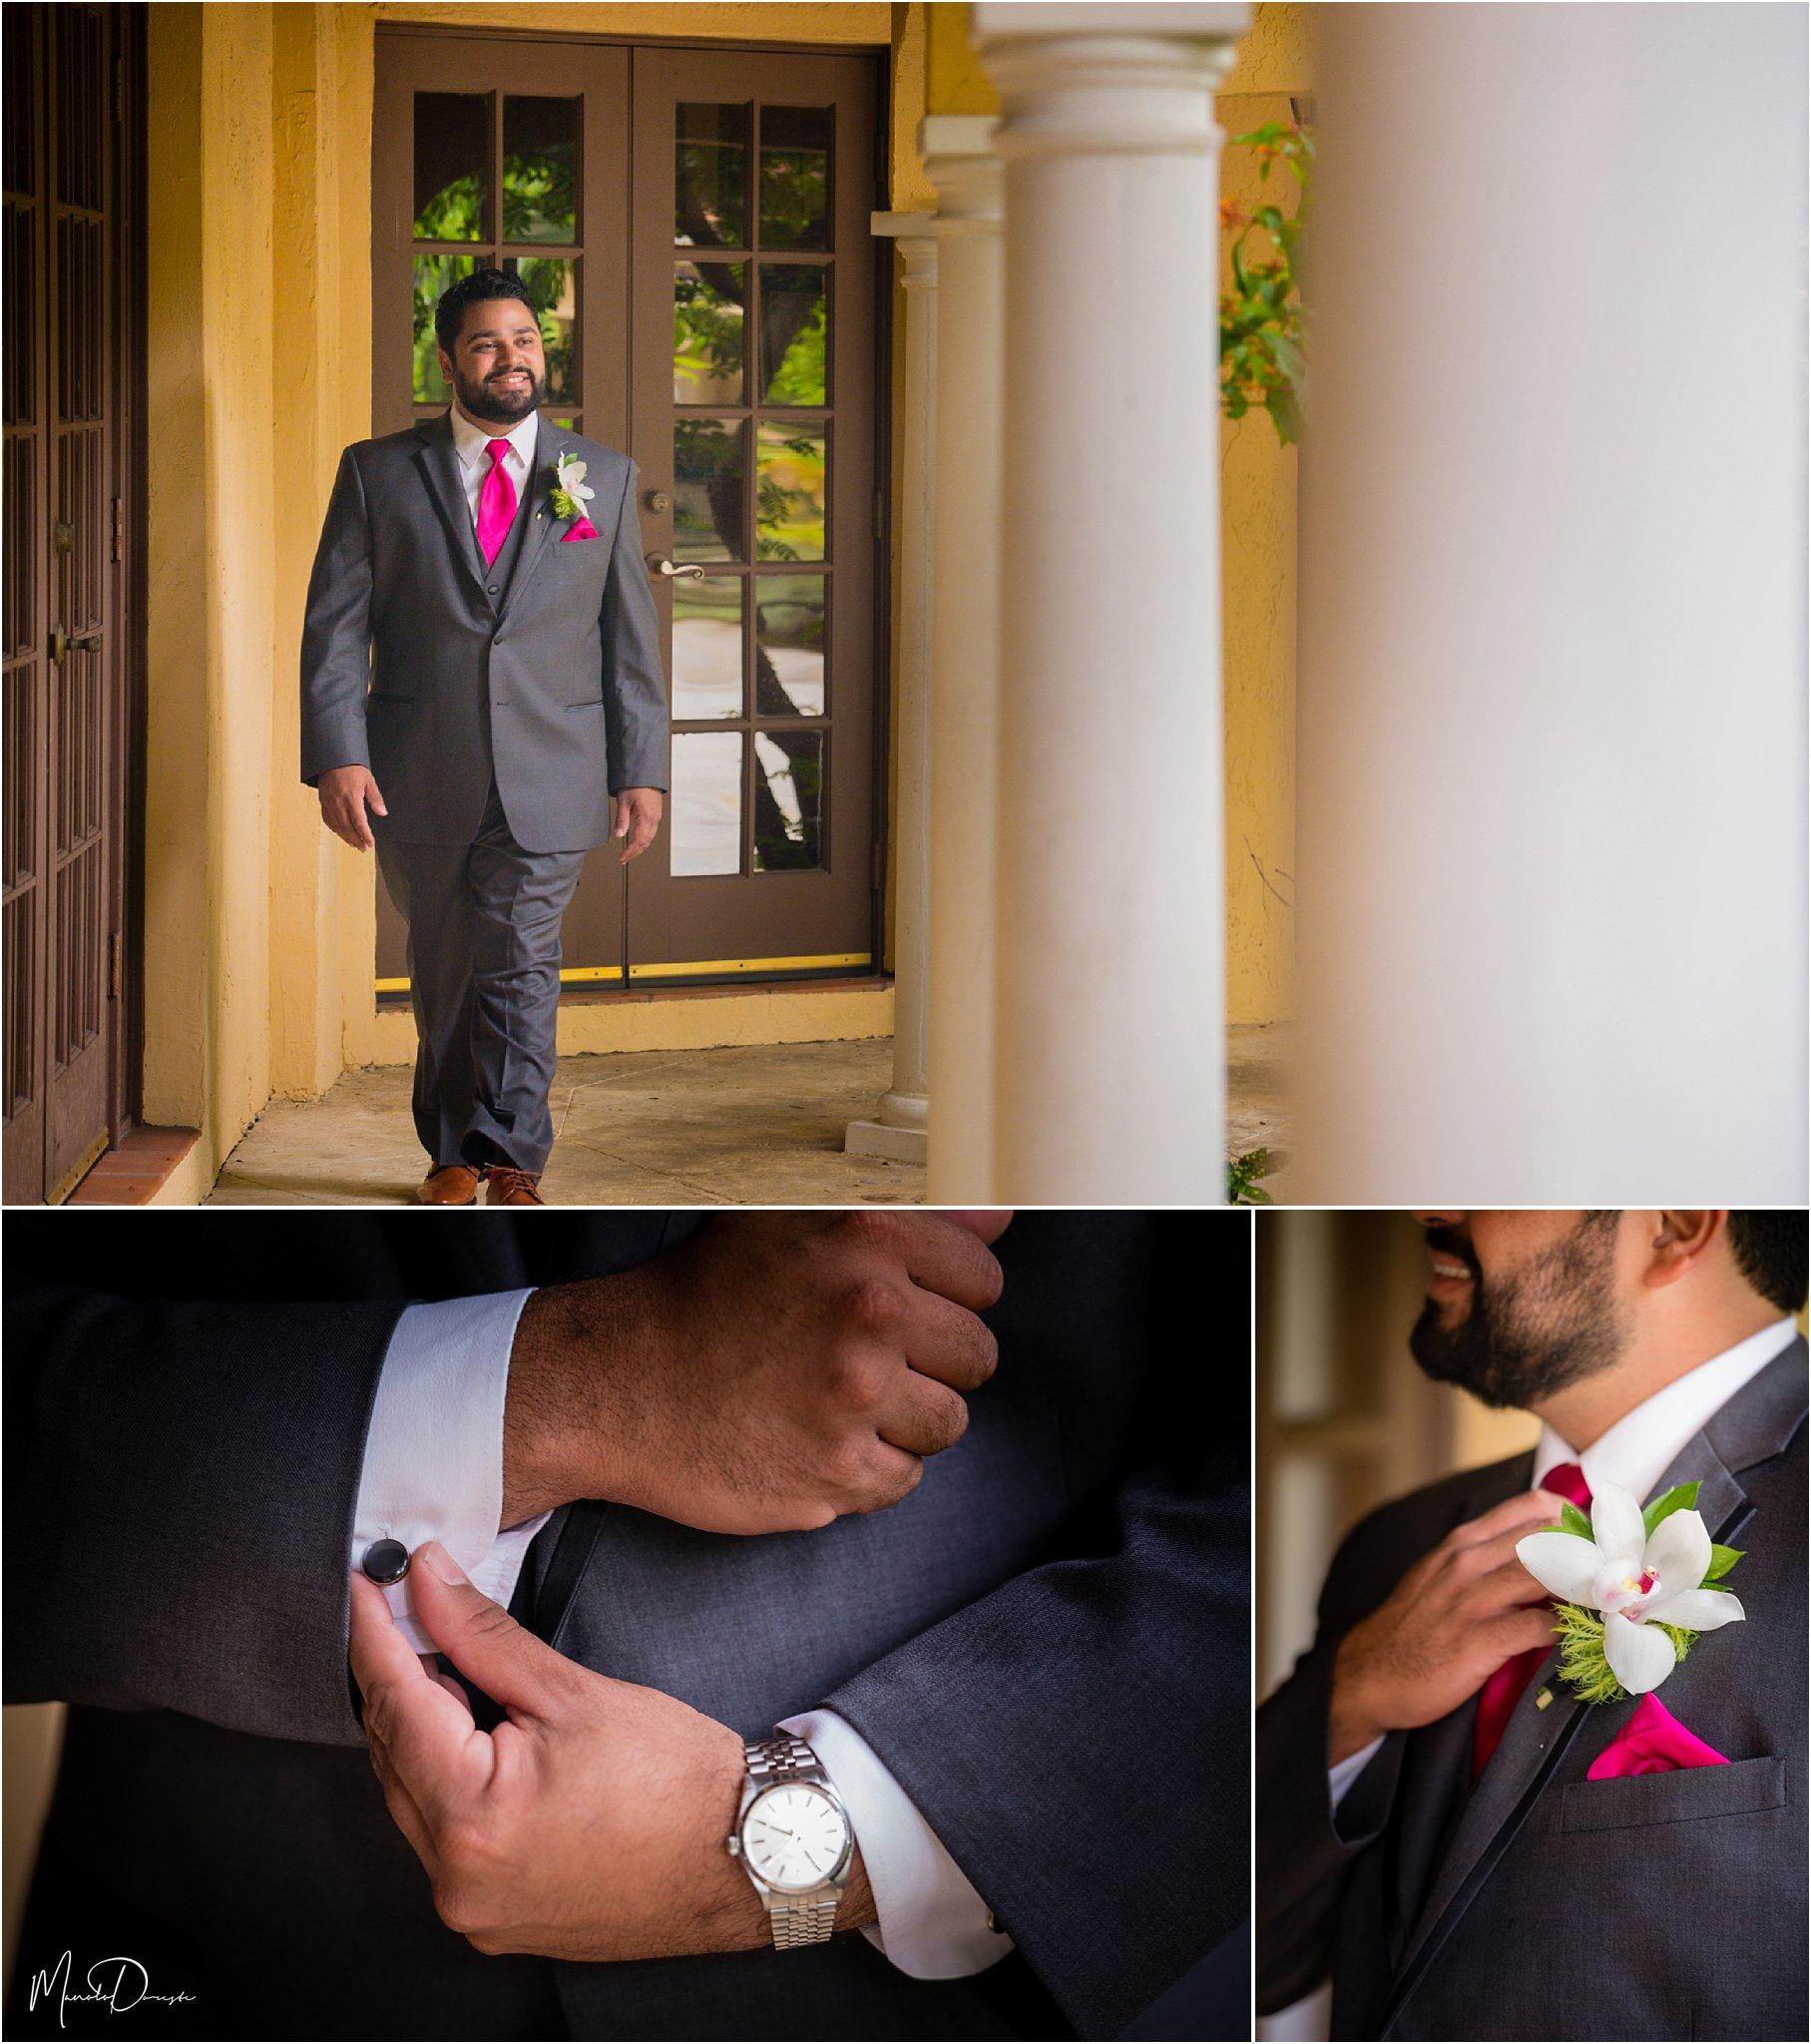 0420_ManoloDoreste_InFocusStudios_Wedding_Family_Photography_Miami_MiamiPhotographer.jpg